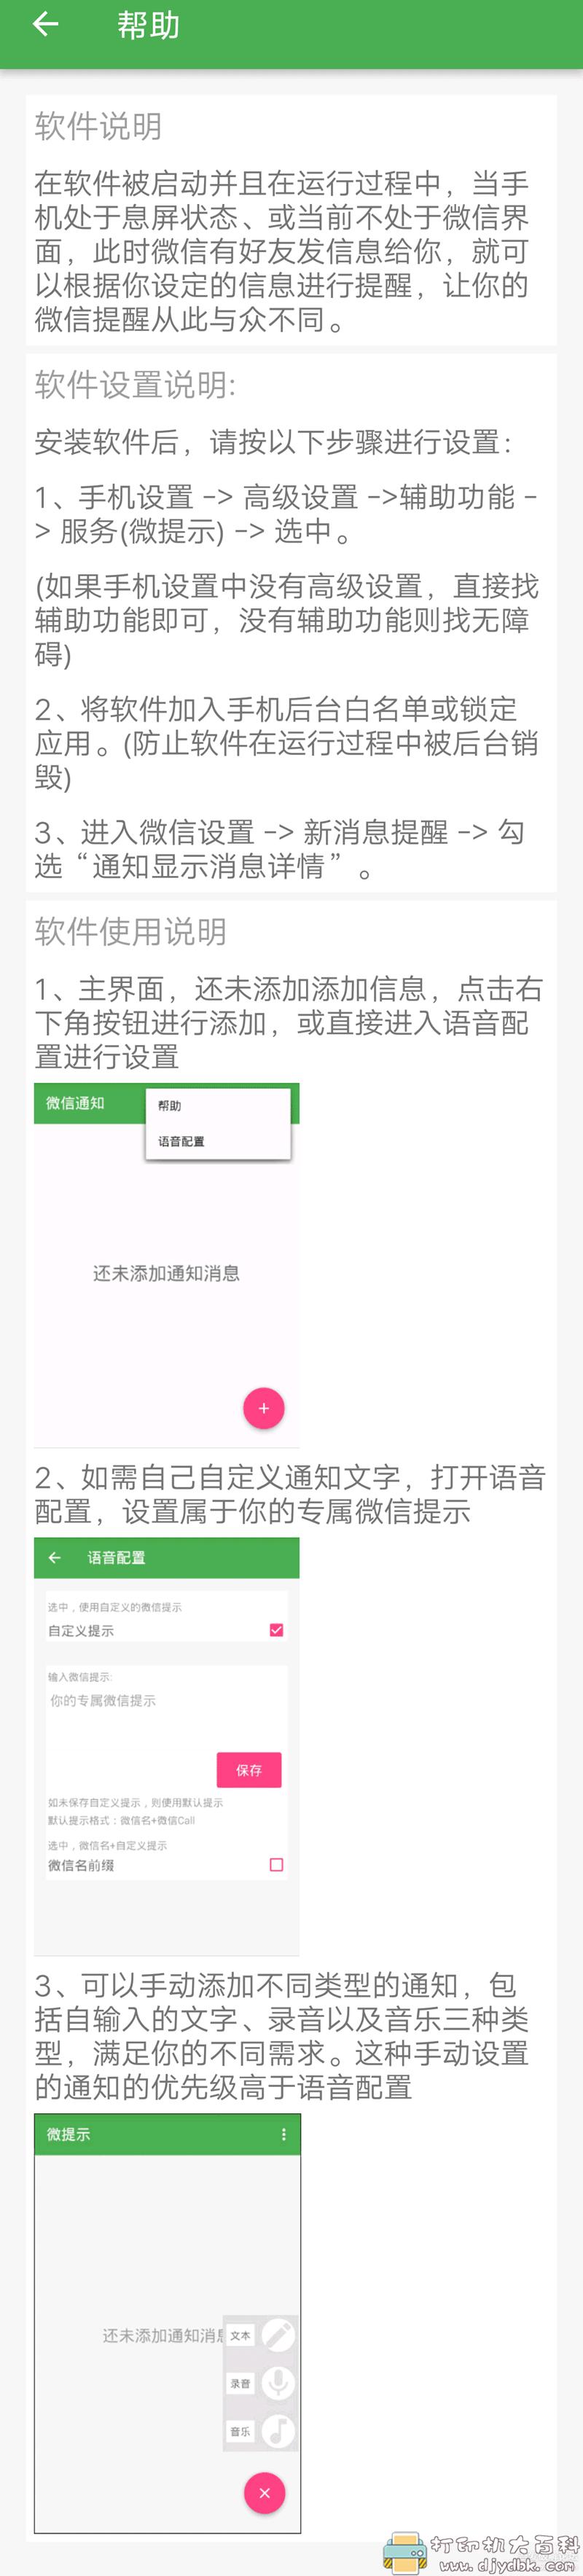 [Android]自定义微信提示音工具:微提示v1.1 配图 No.3